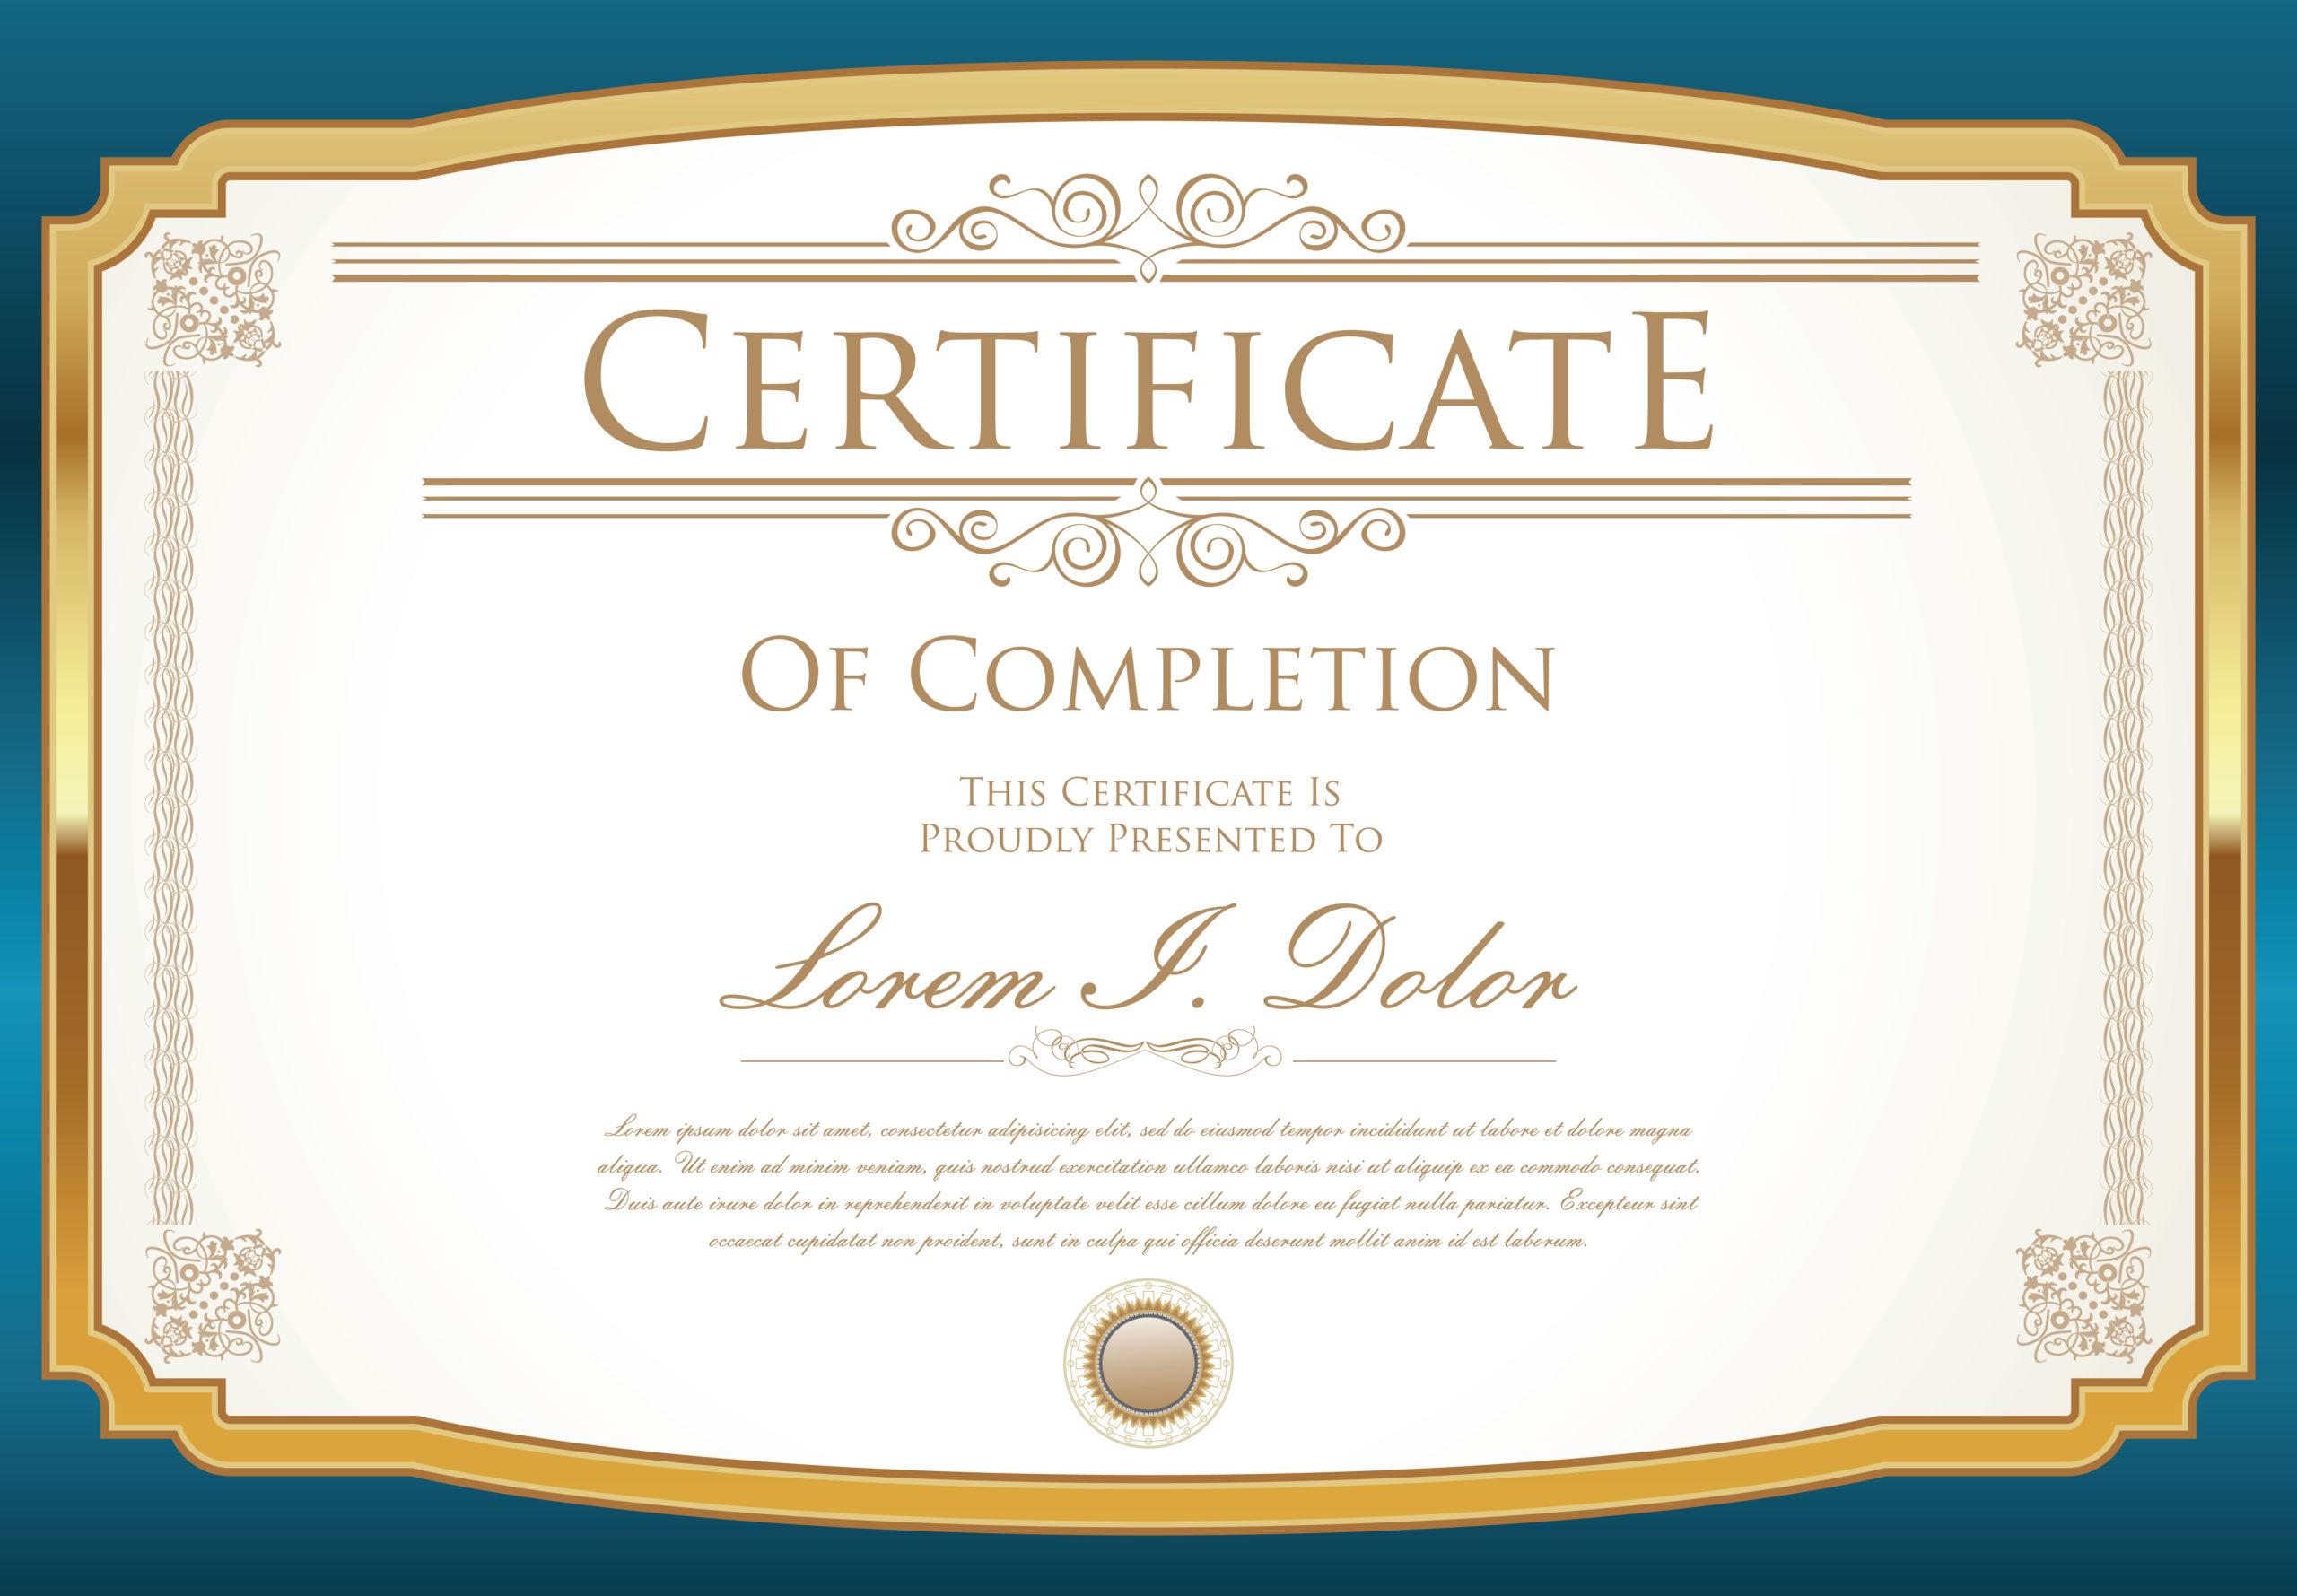 Certificate Template  Download Free Vectors Clipart within Quality Art Certificate Template Free